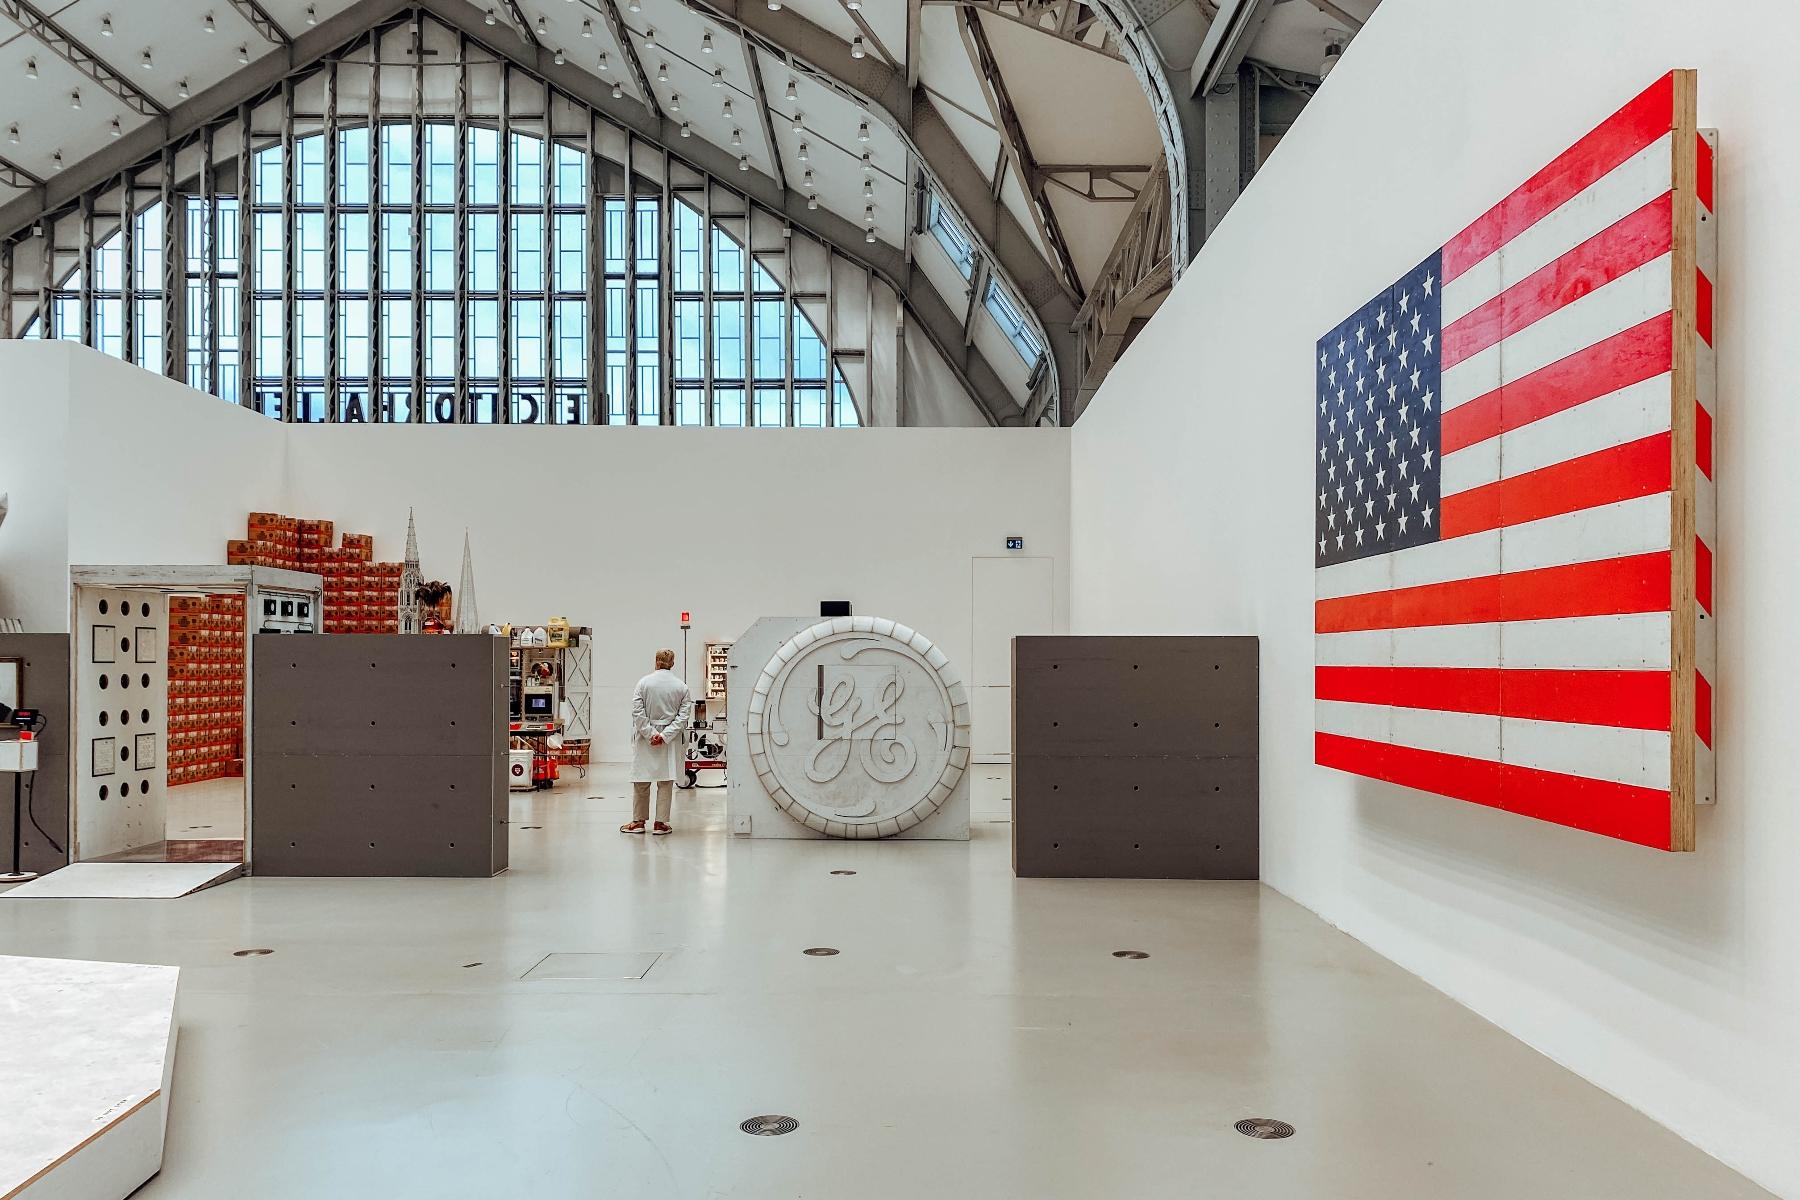 Geheimtipp Hamburg Kunst & Kultur Ausstellung Tom Sachs Space Program Lilli Sprung Sophie Stögmüller 11